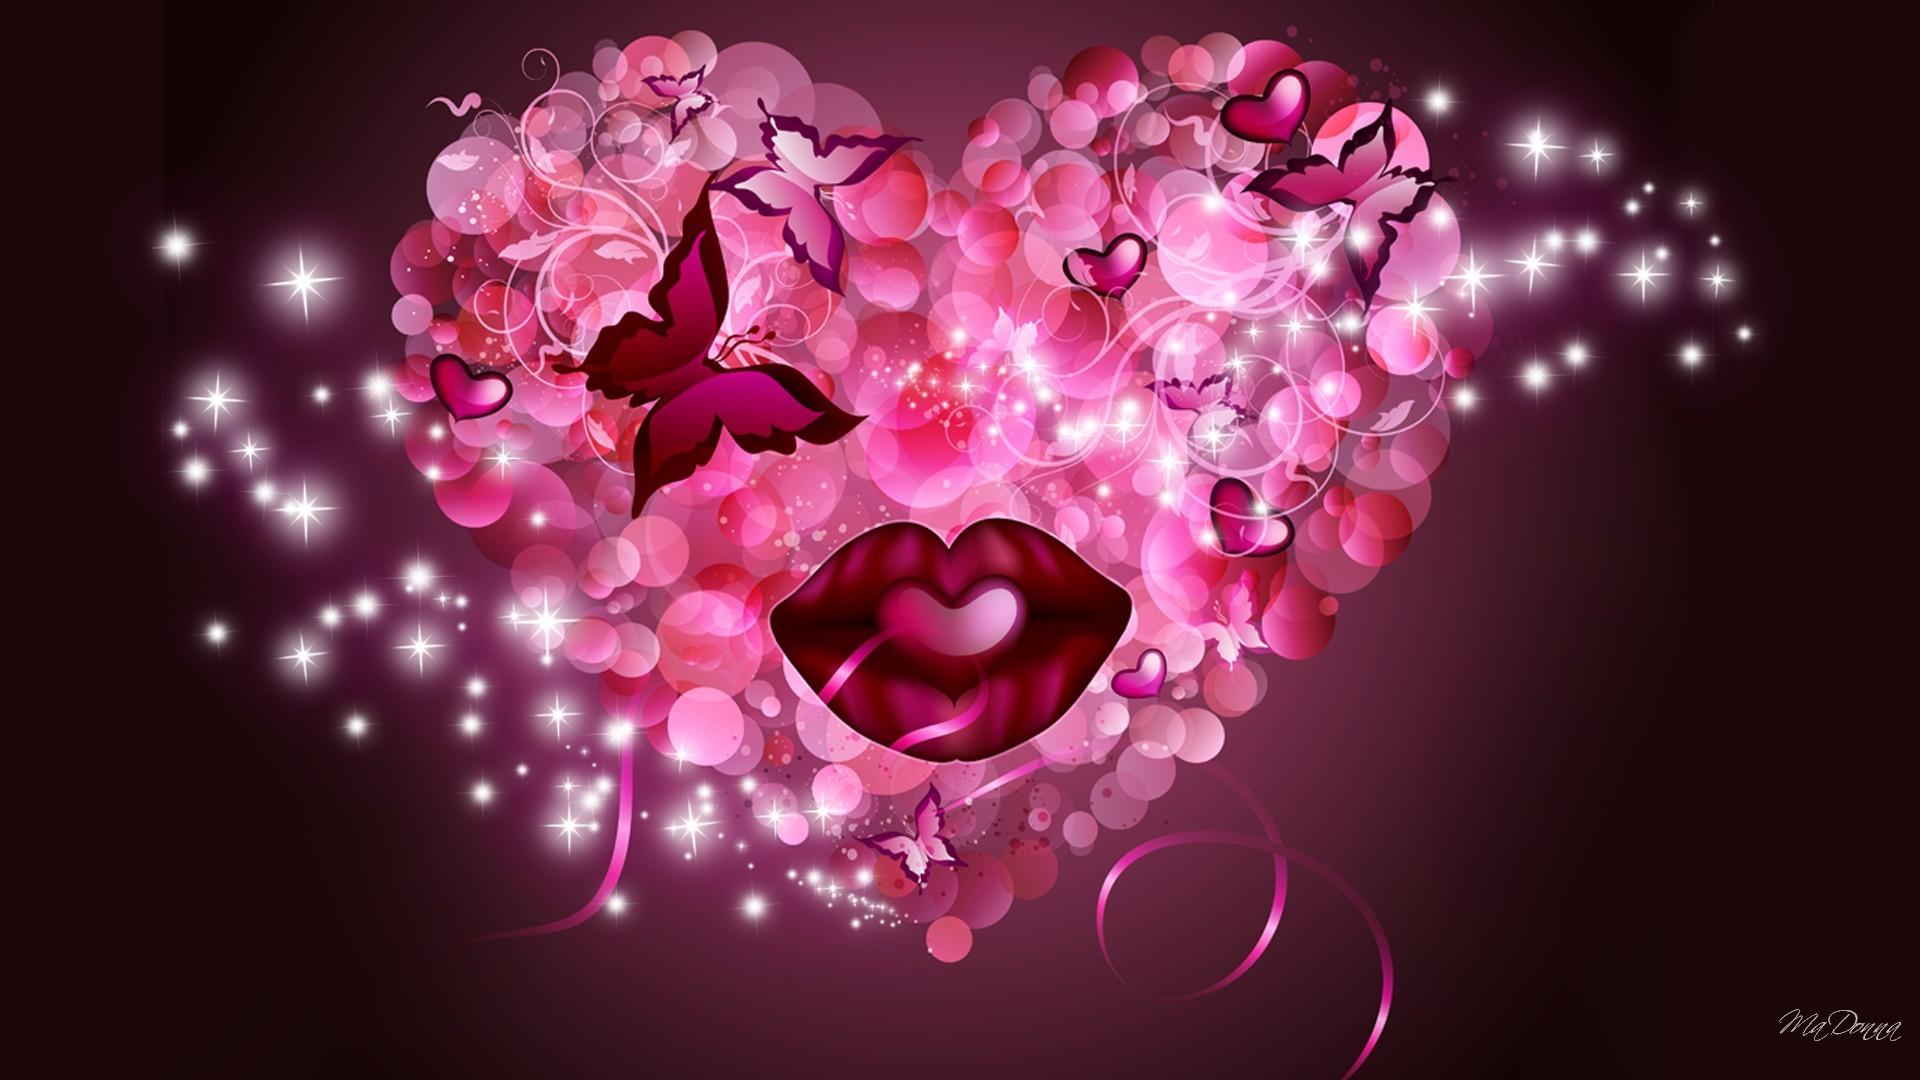 Res: 1920x1080, love heart hd wallpaper ...